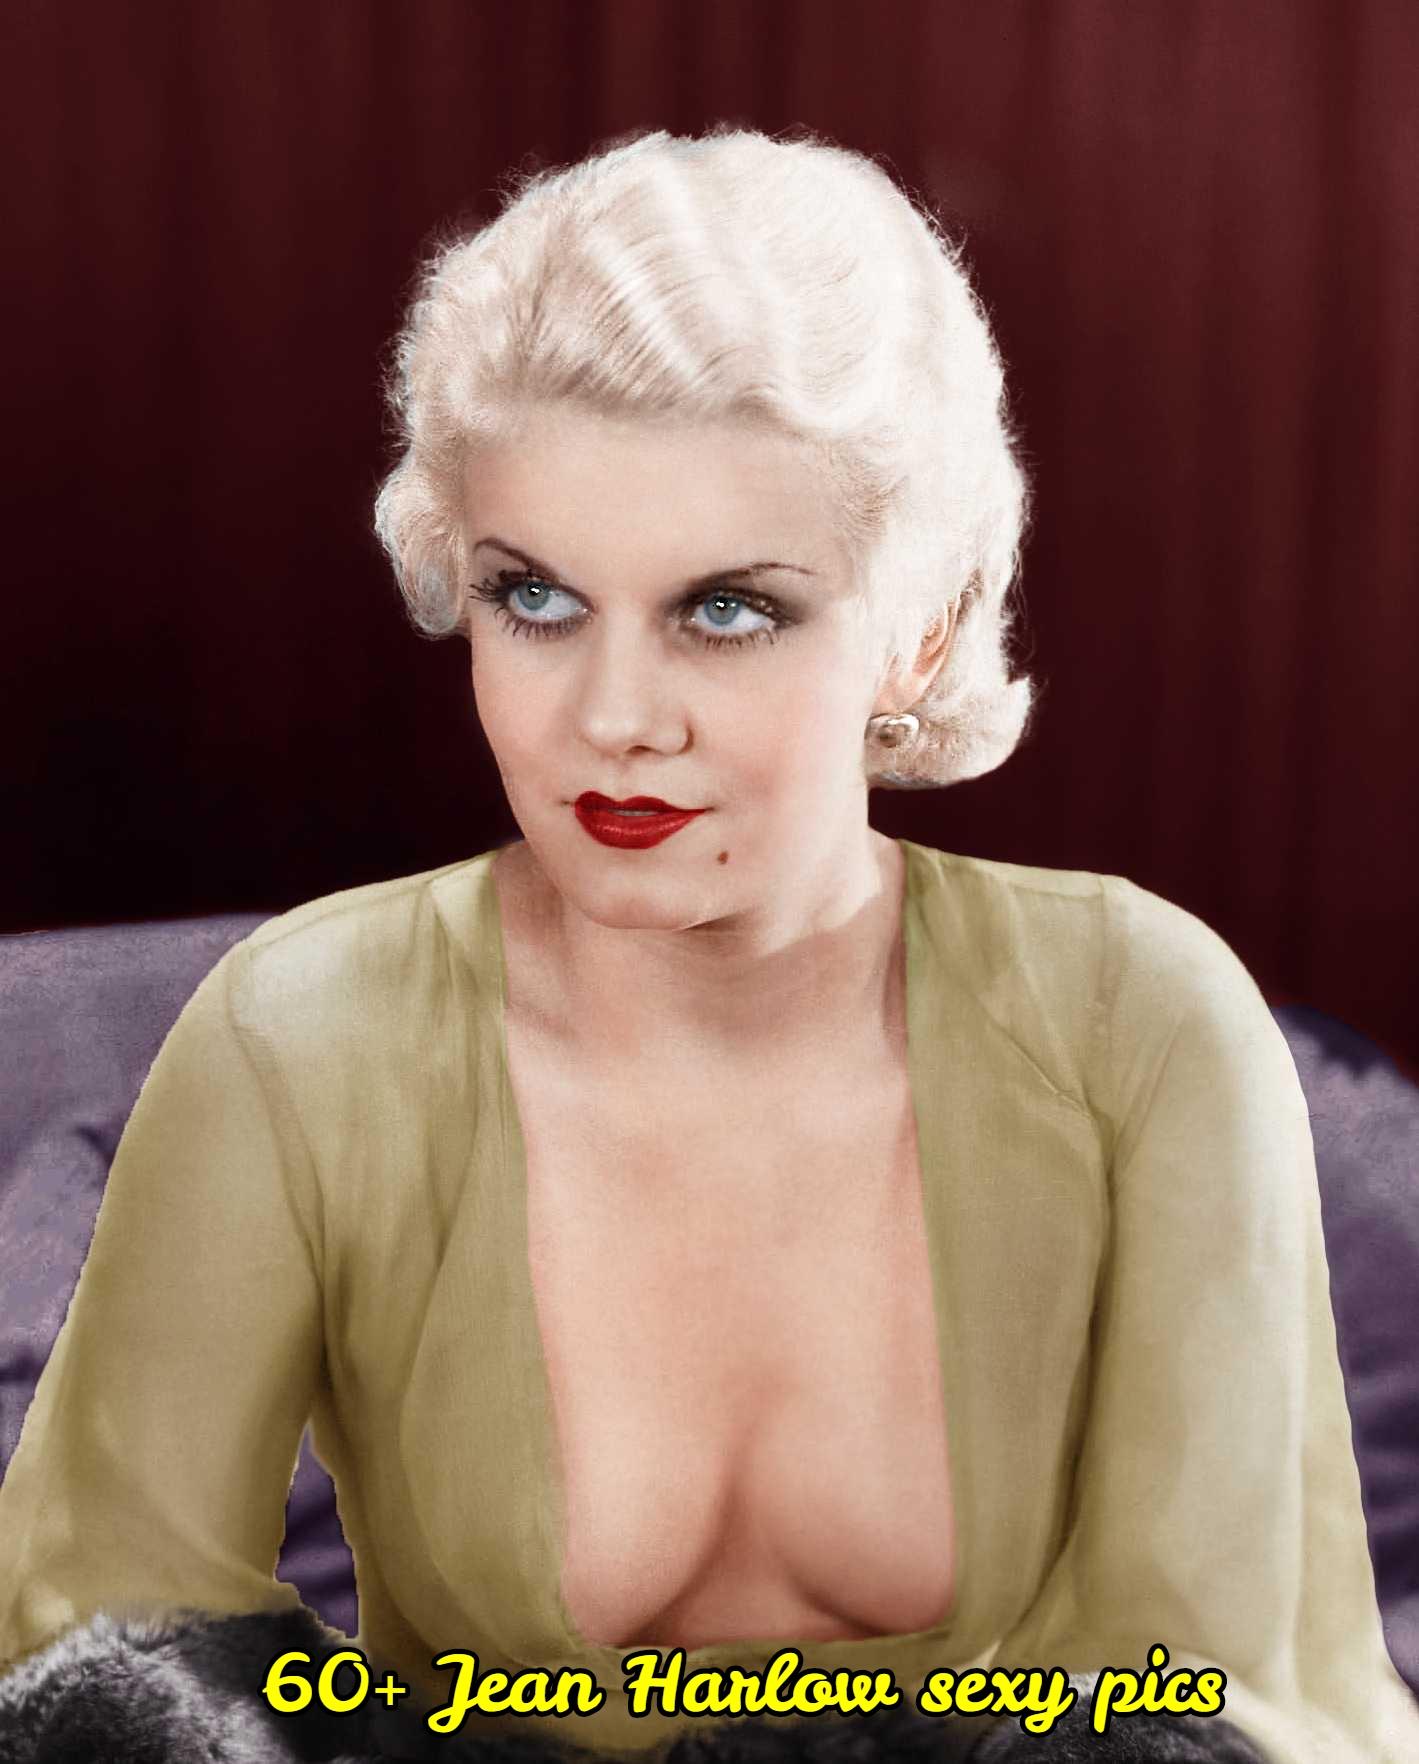 Jean Harlow cleavage pic